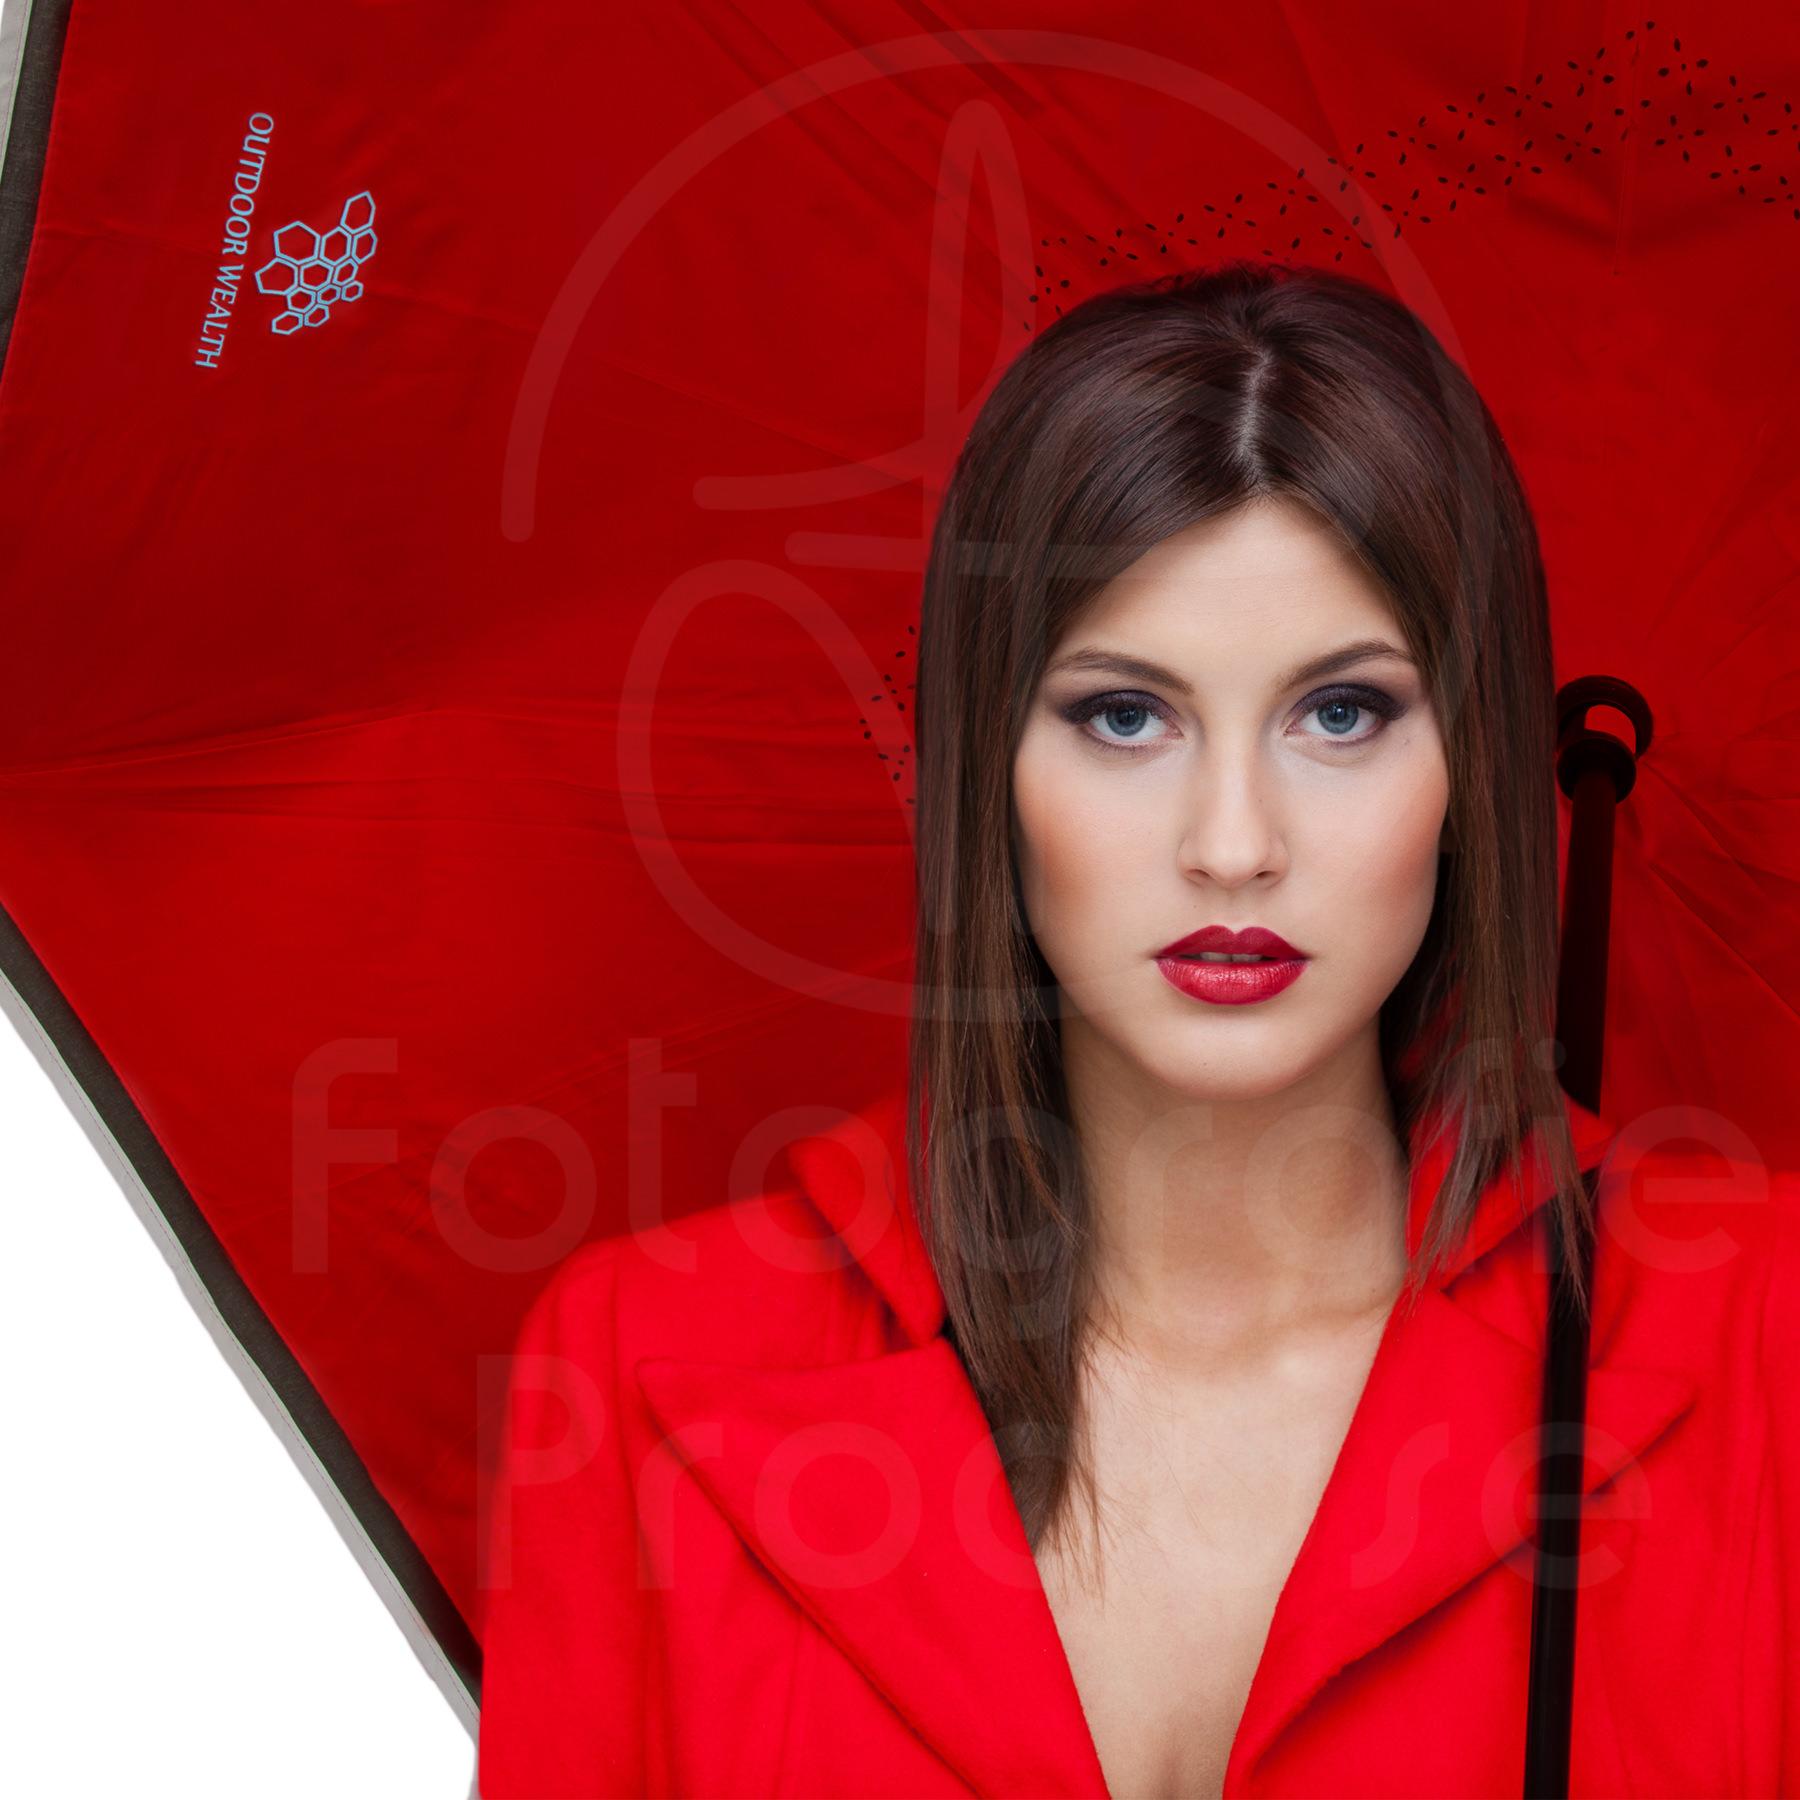 fotografie amazon